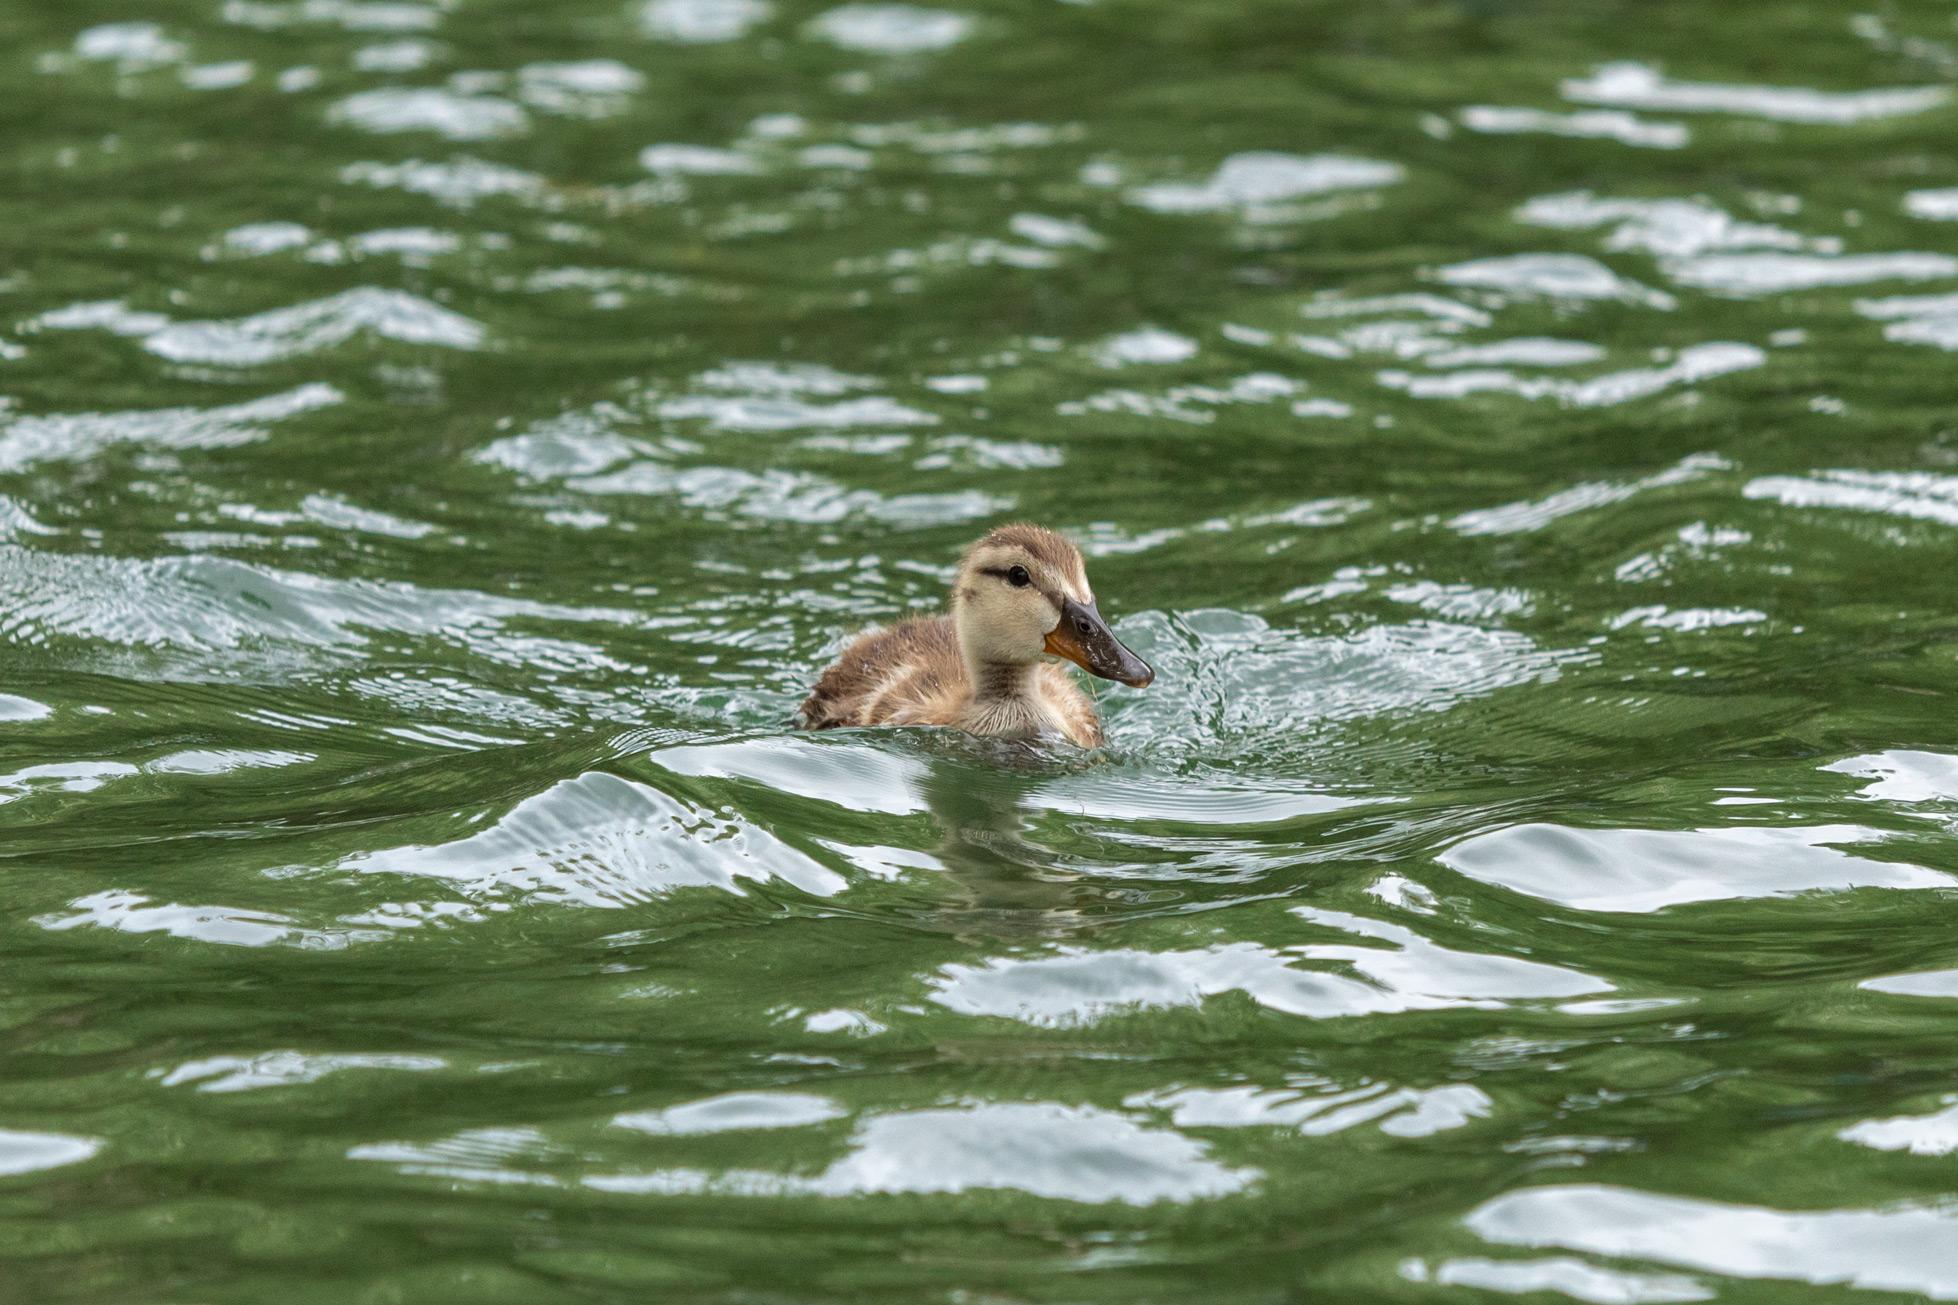 Baby mallard duck swimming